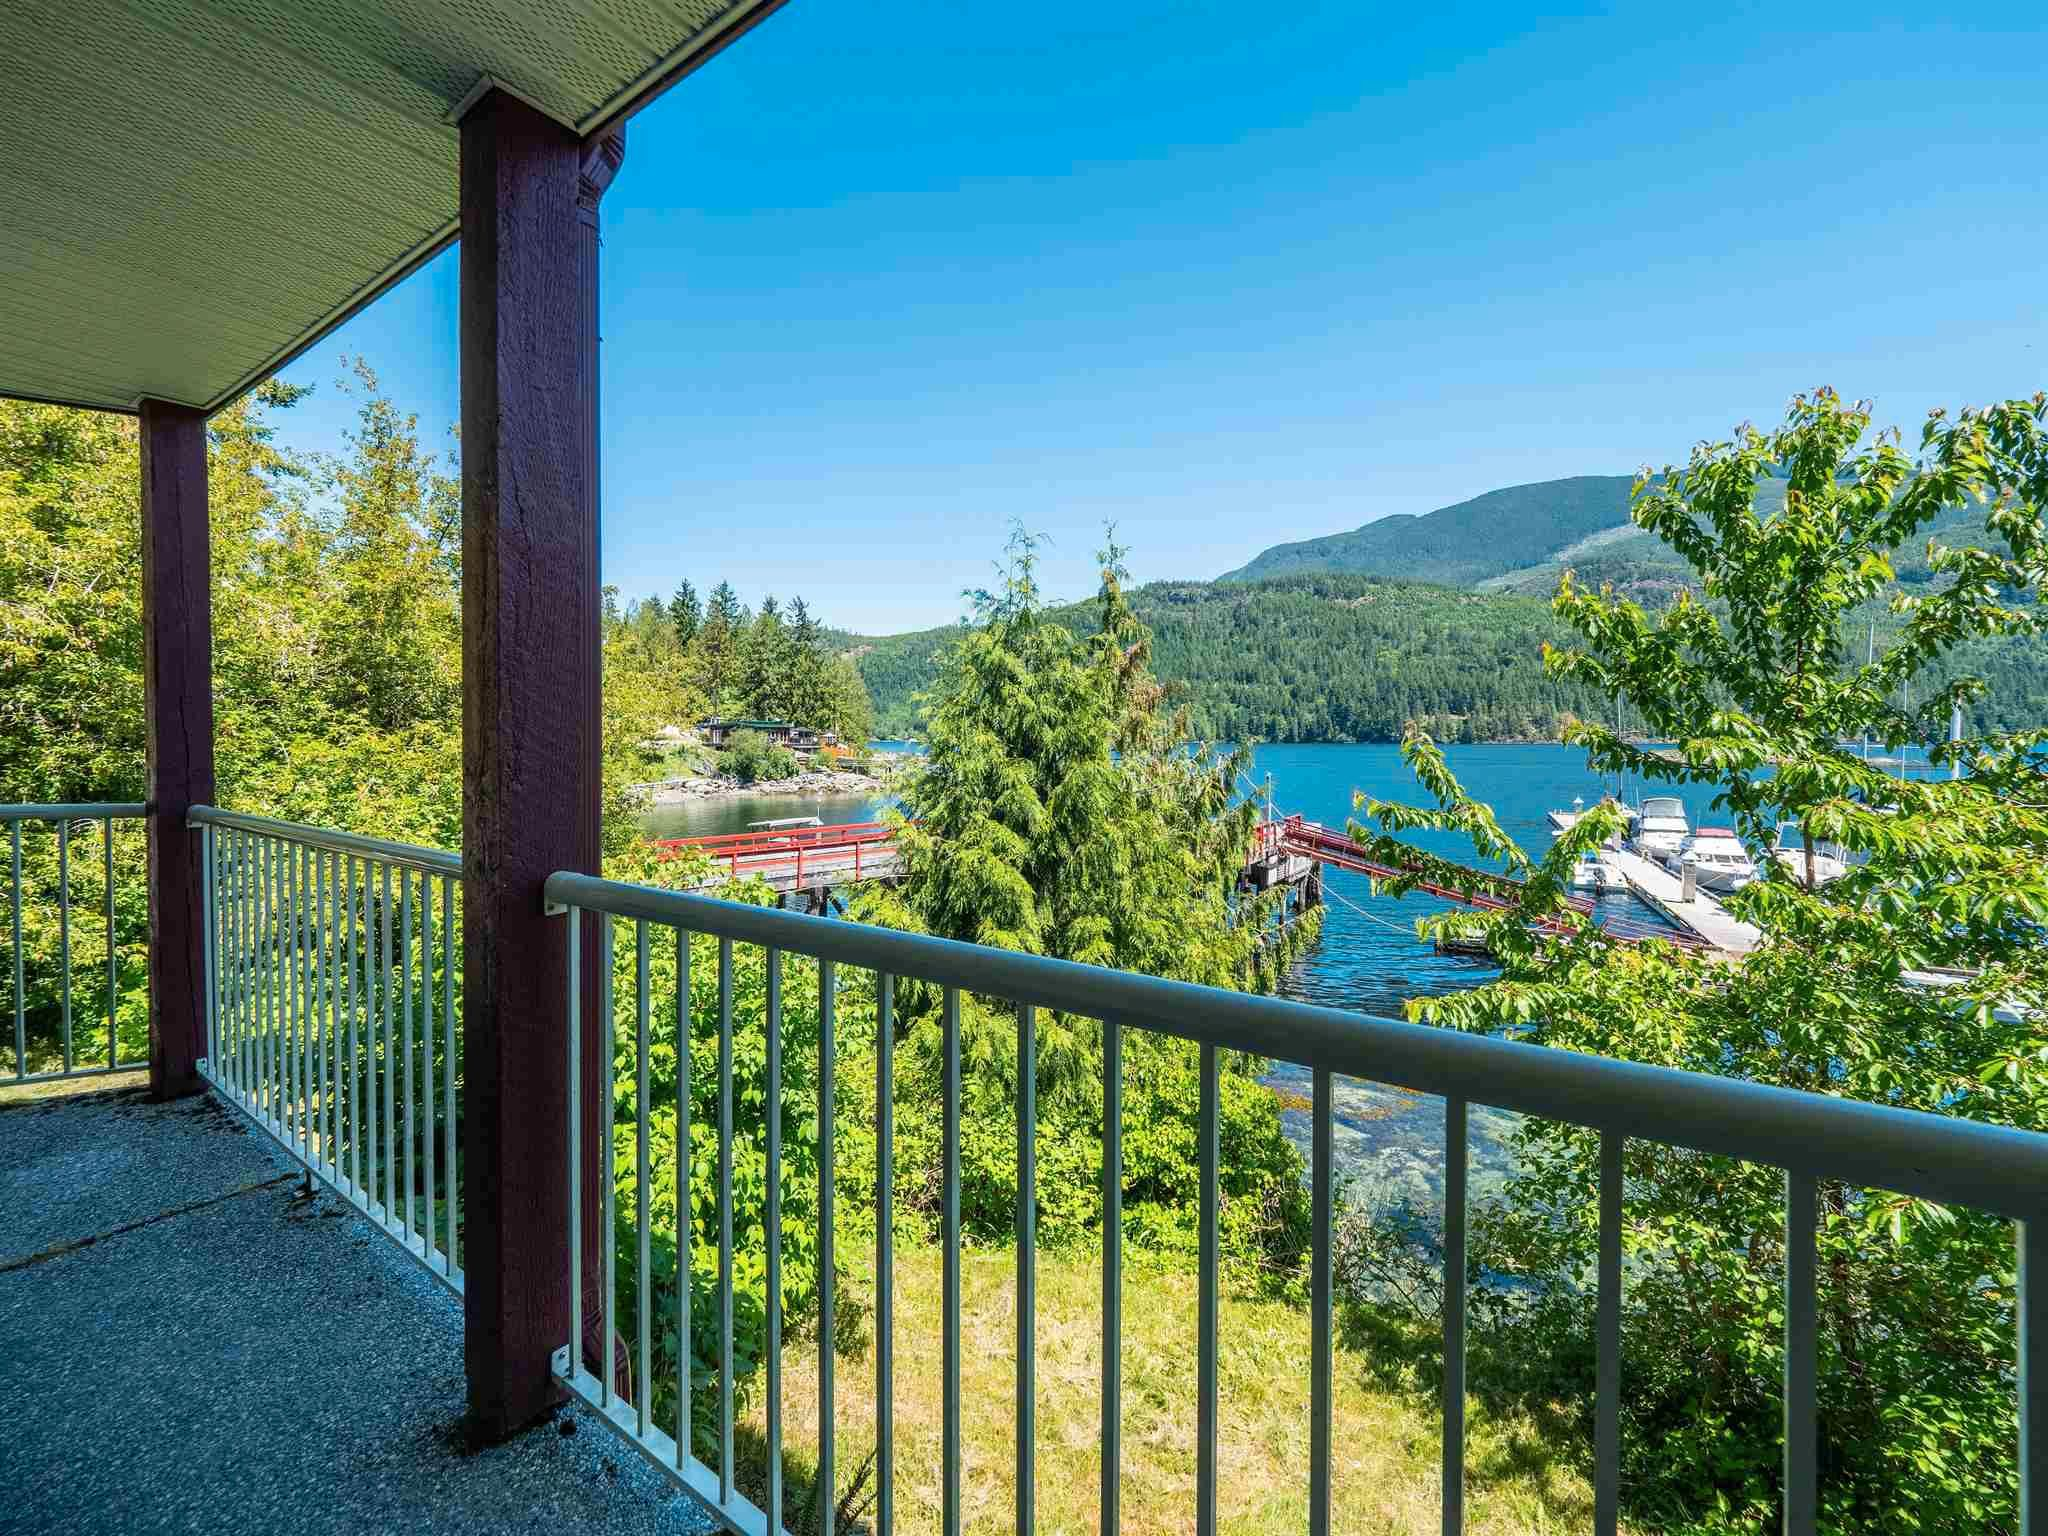 Photo 15: Photos: 6781 BATHGATE Road in Egmont: Pender Harbour Egmont House for sale (Sunshine Coast)  : MLS®# R2593981